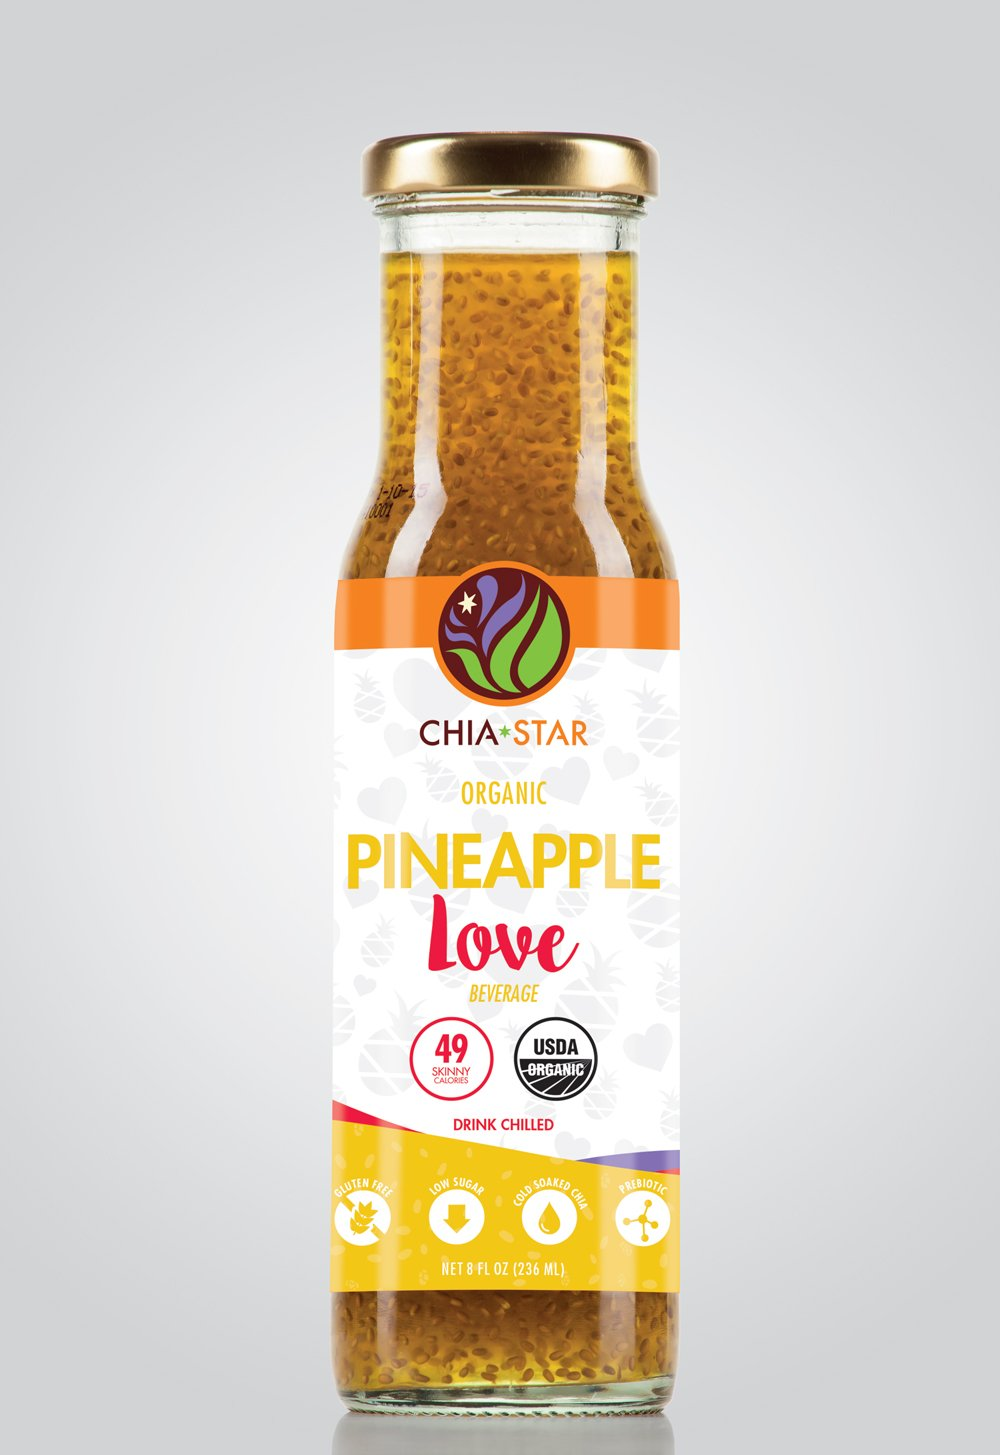 Chia Star Pineapple Honey Love three 8 oz bottles